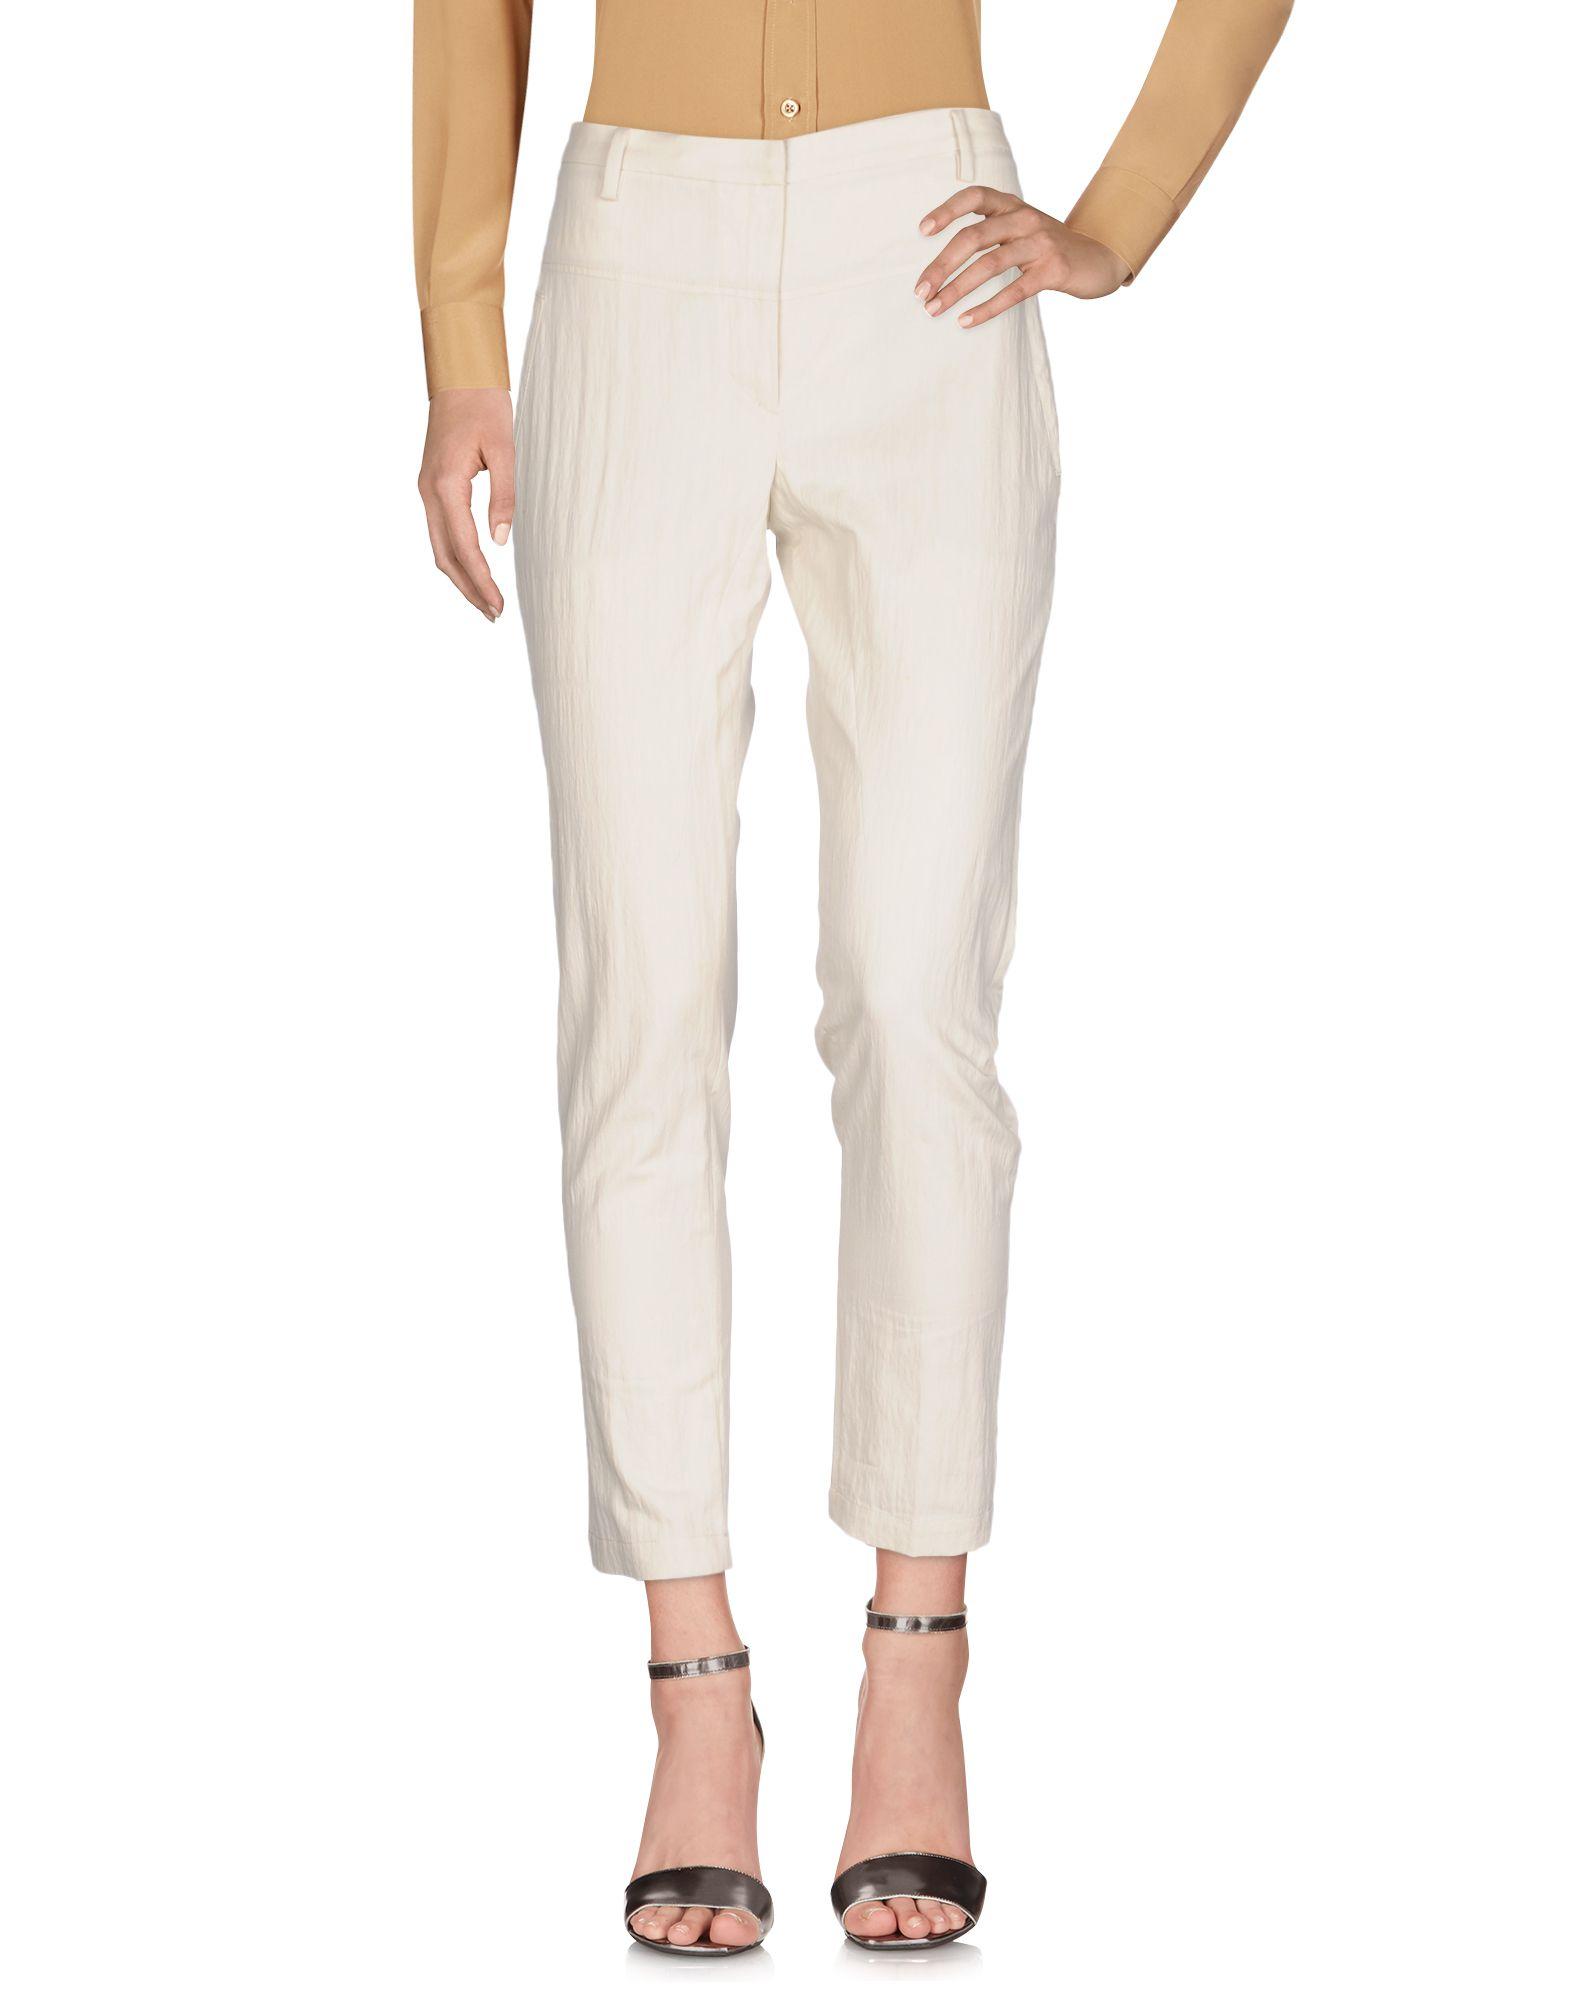 Pantalone Brunello Cucinelli Donna - Acquista online su JnrBRfVt